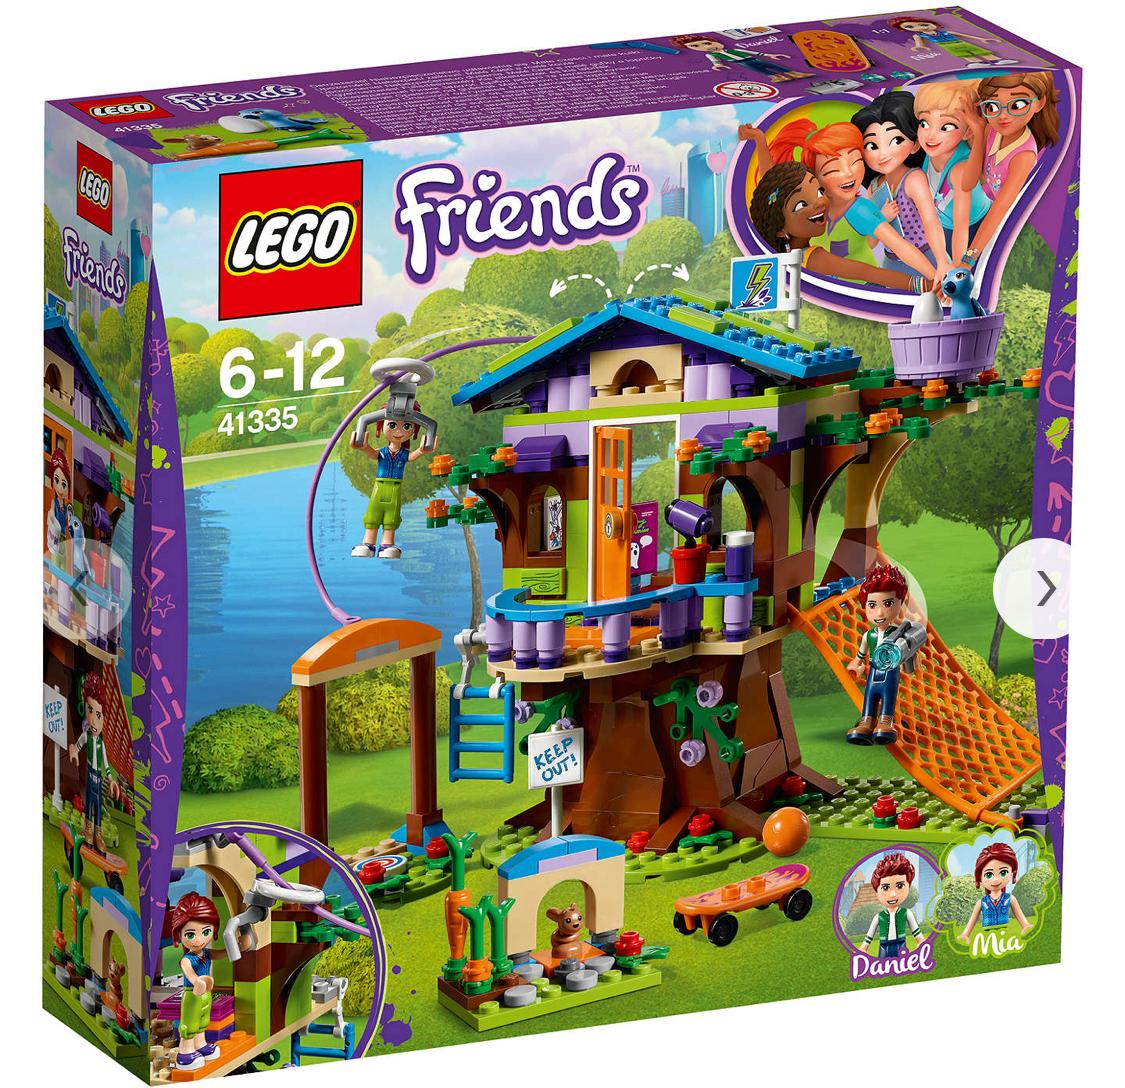 LEGO Friends 41335 Mia's Tree House , £18.97 C+C @ Asda George